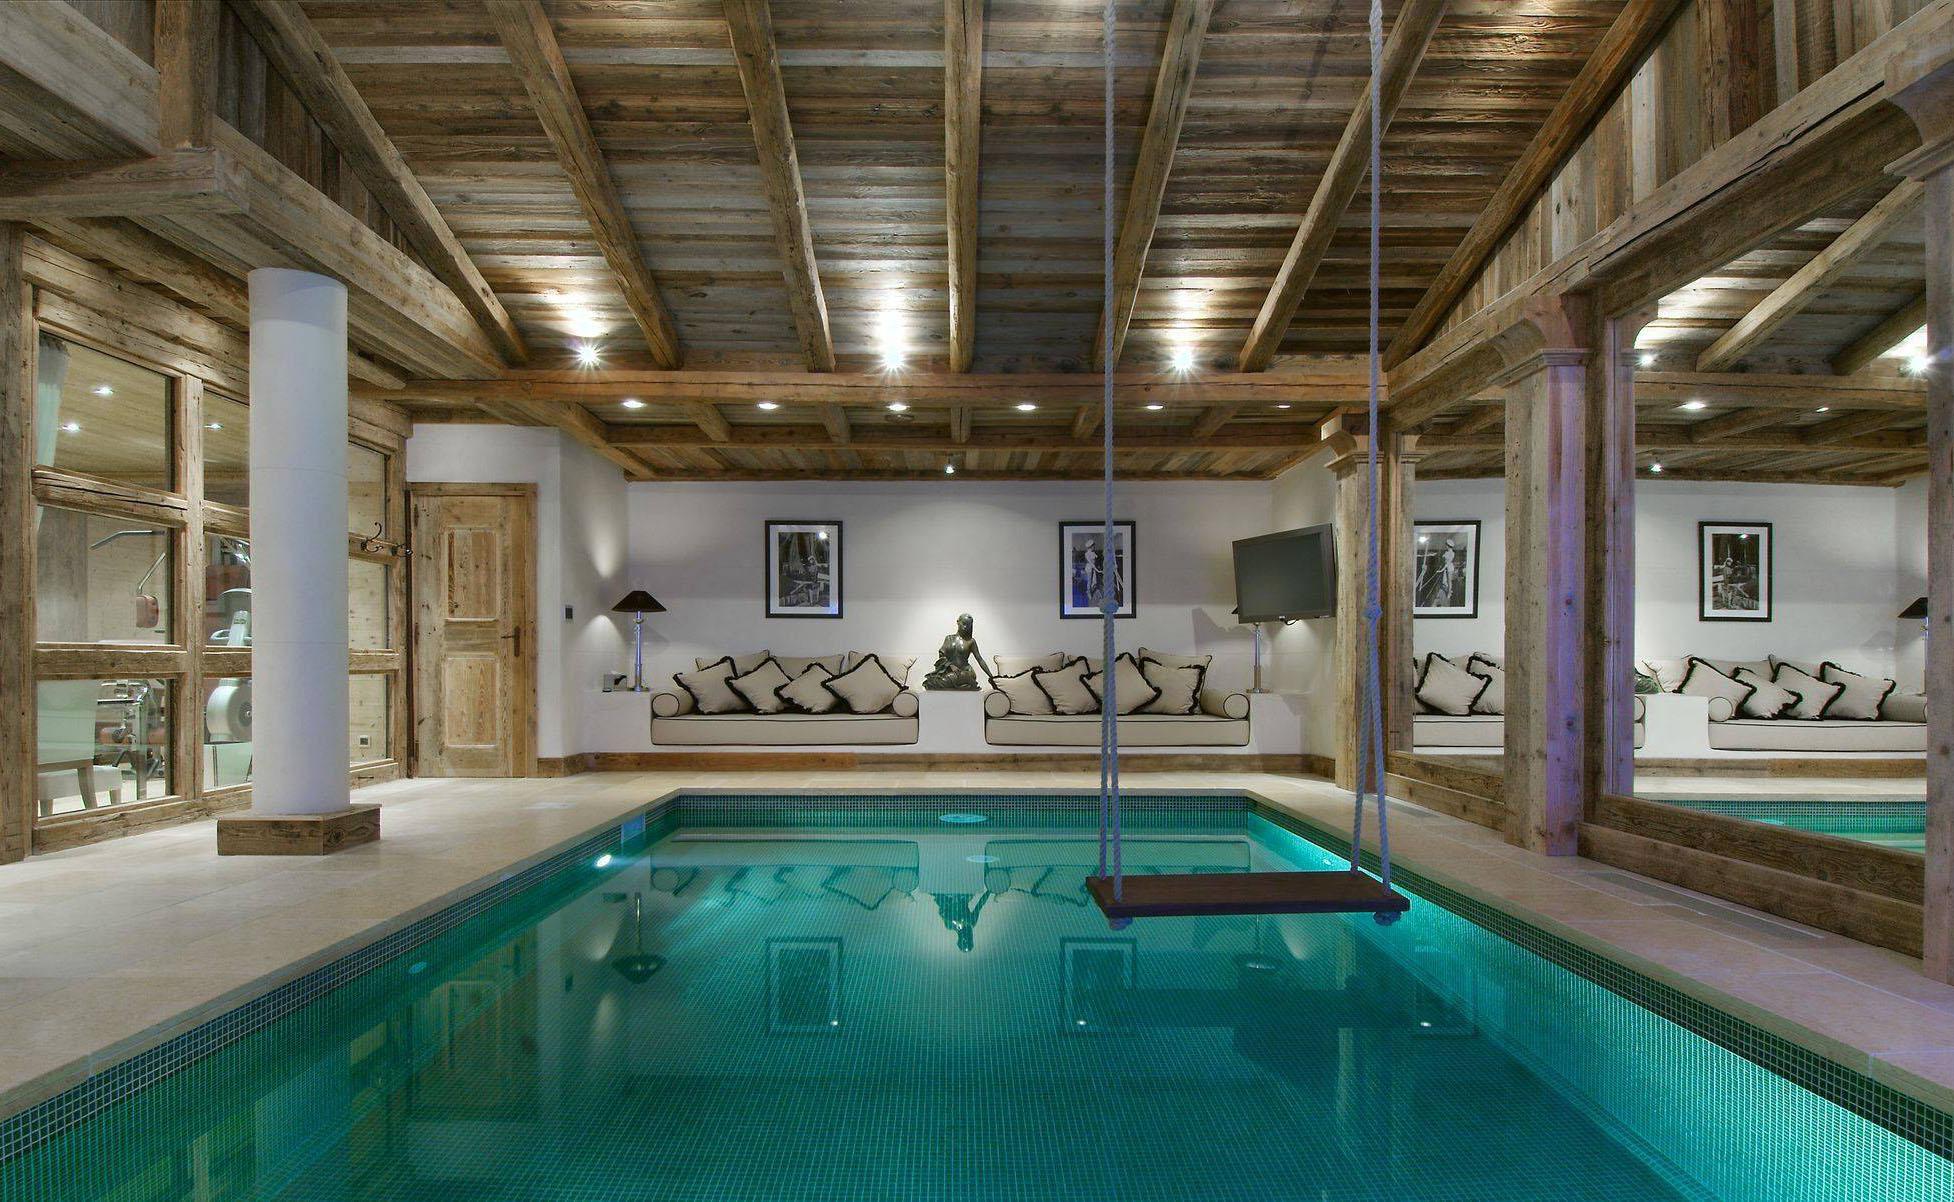 Lovelydays luxury service apartment rental - Courchevel - Great Roc Chalet - Partner - 7 bedrooms - 6 bathrooms - Inside pool - 3b29eb185fec - Lovelydays